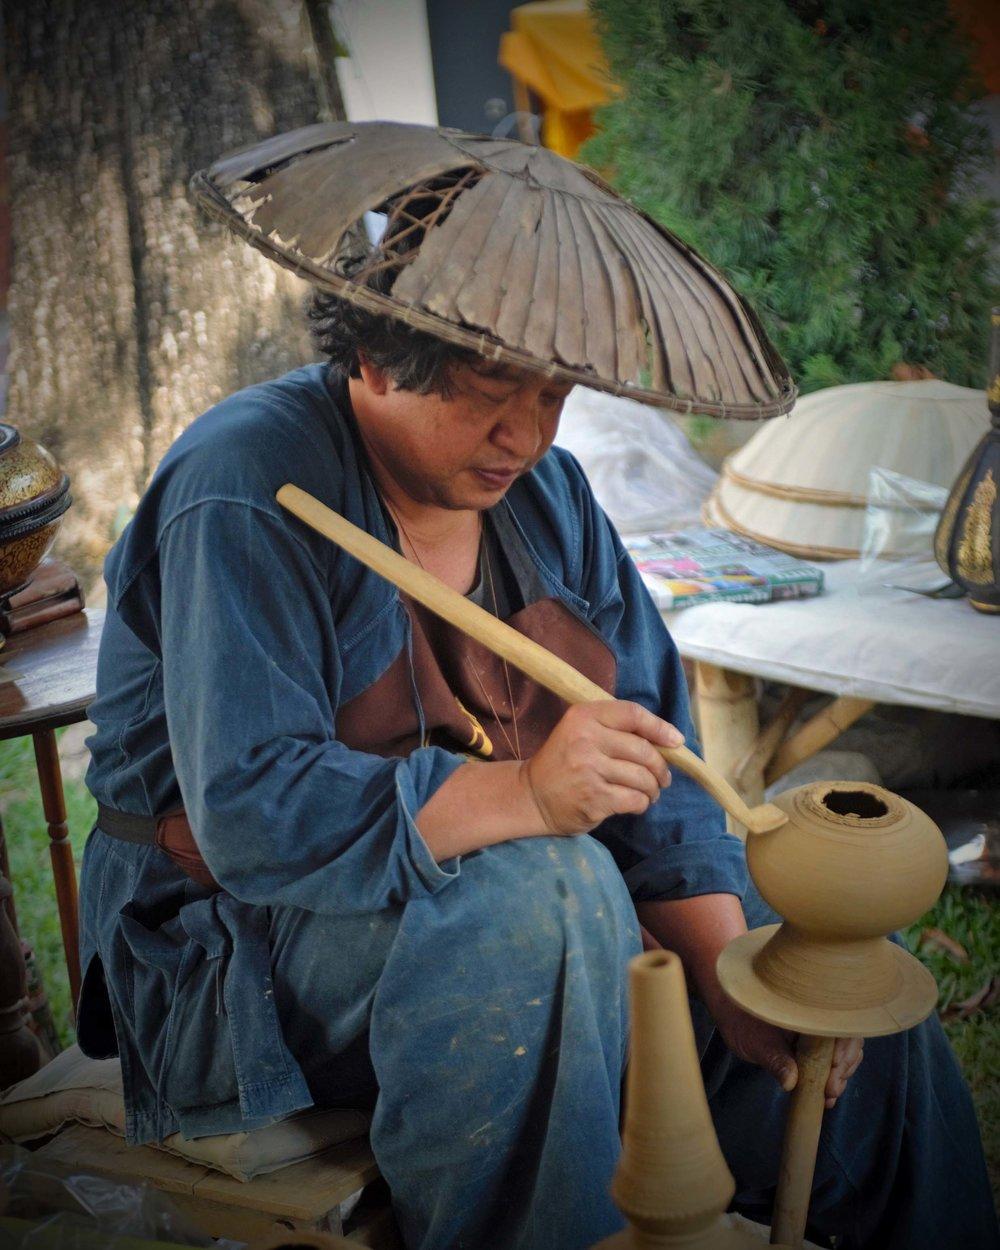 Pottery artist, Chaing Mai, Thailand